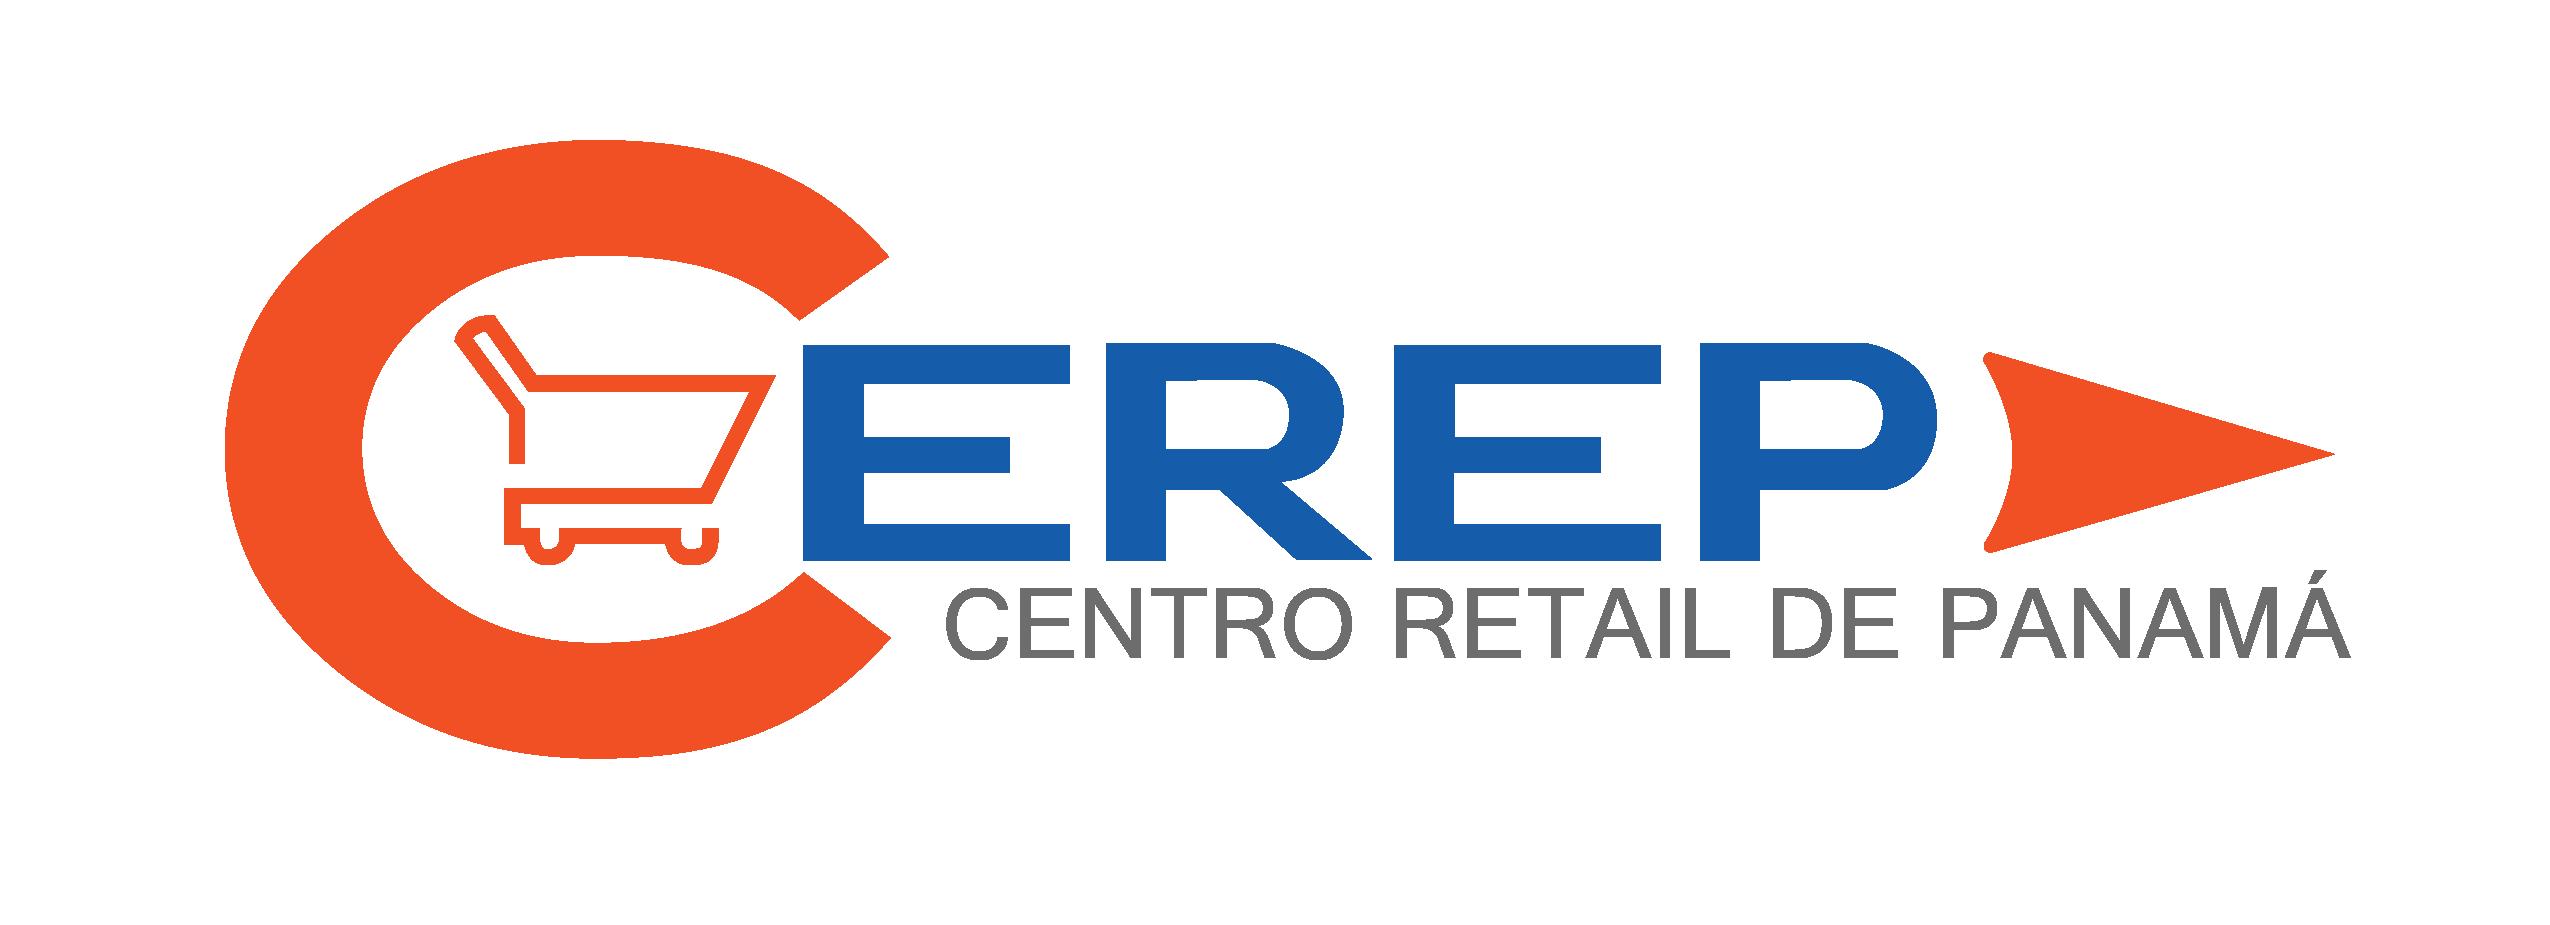 Acerca del CEREP